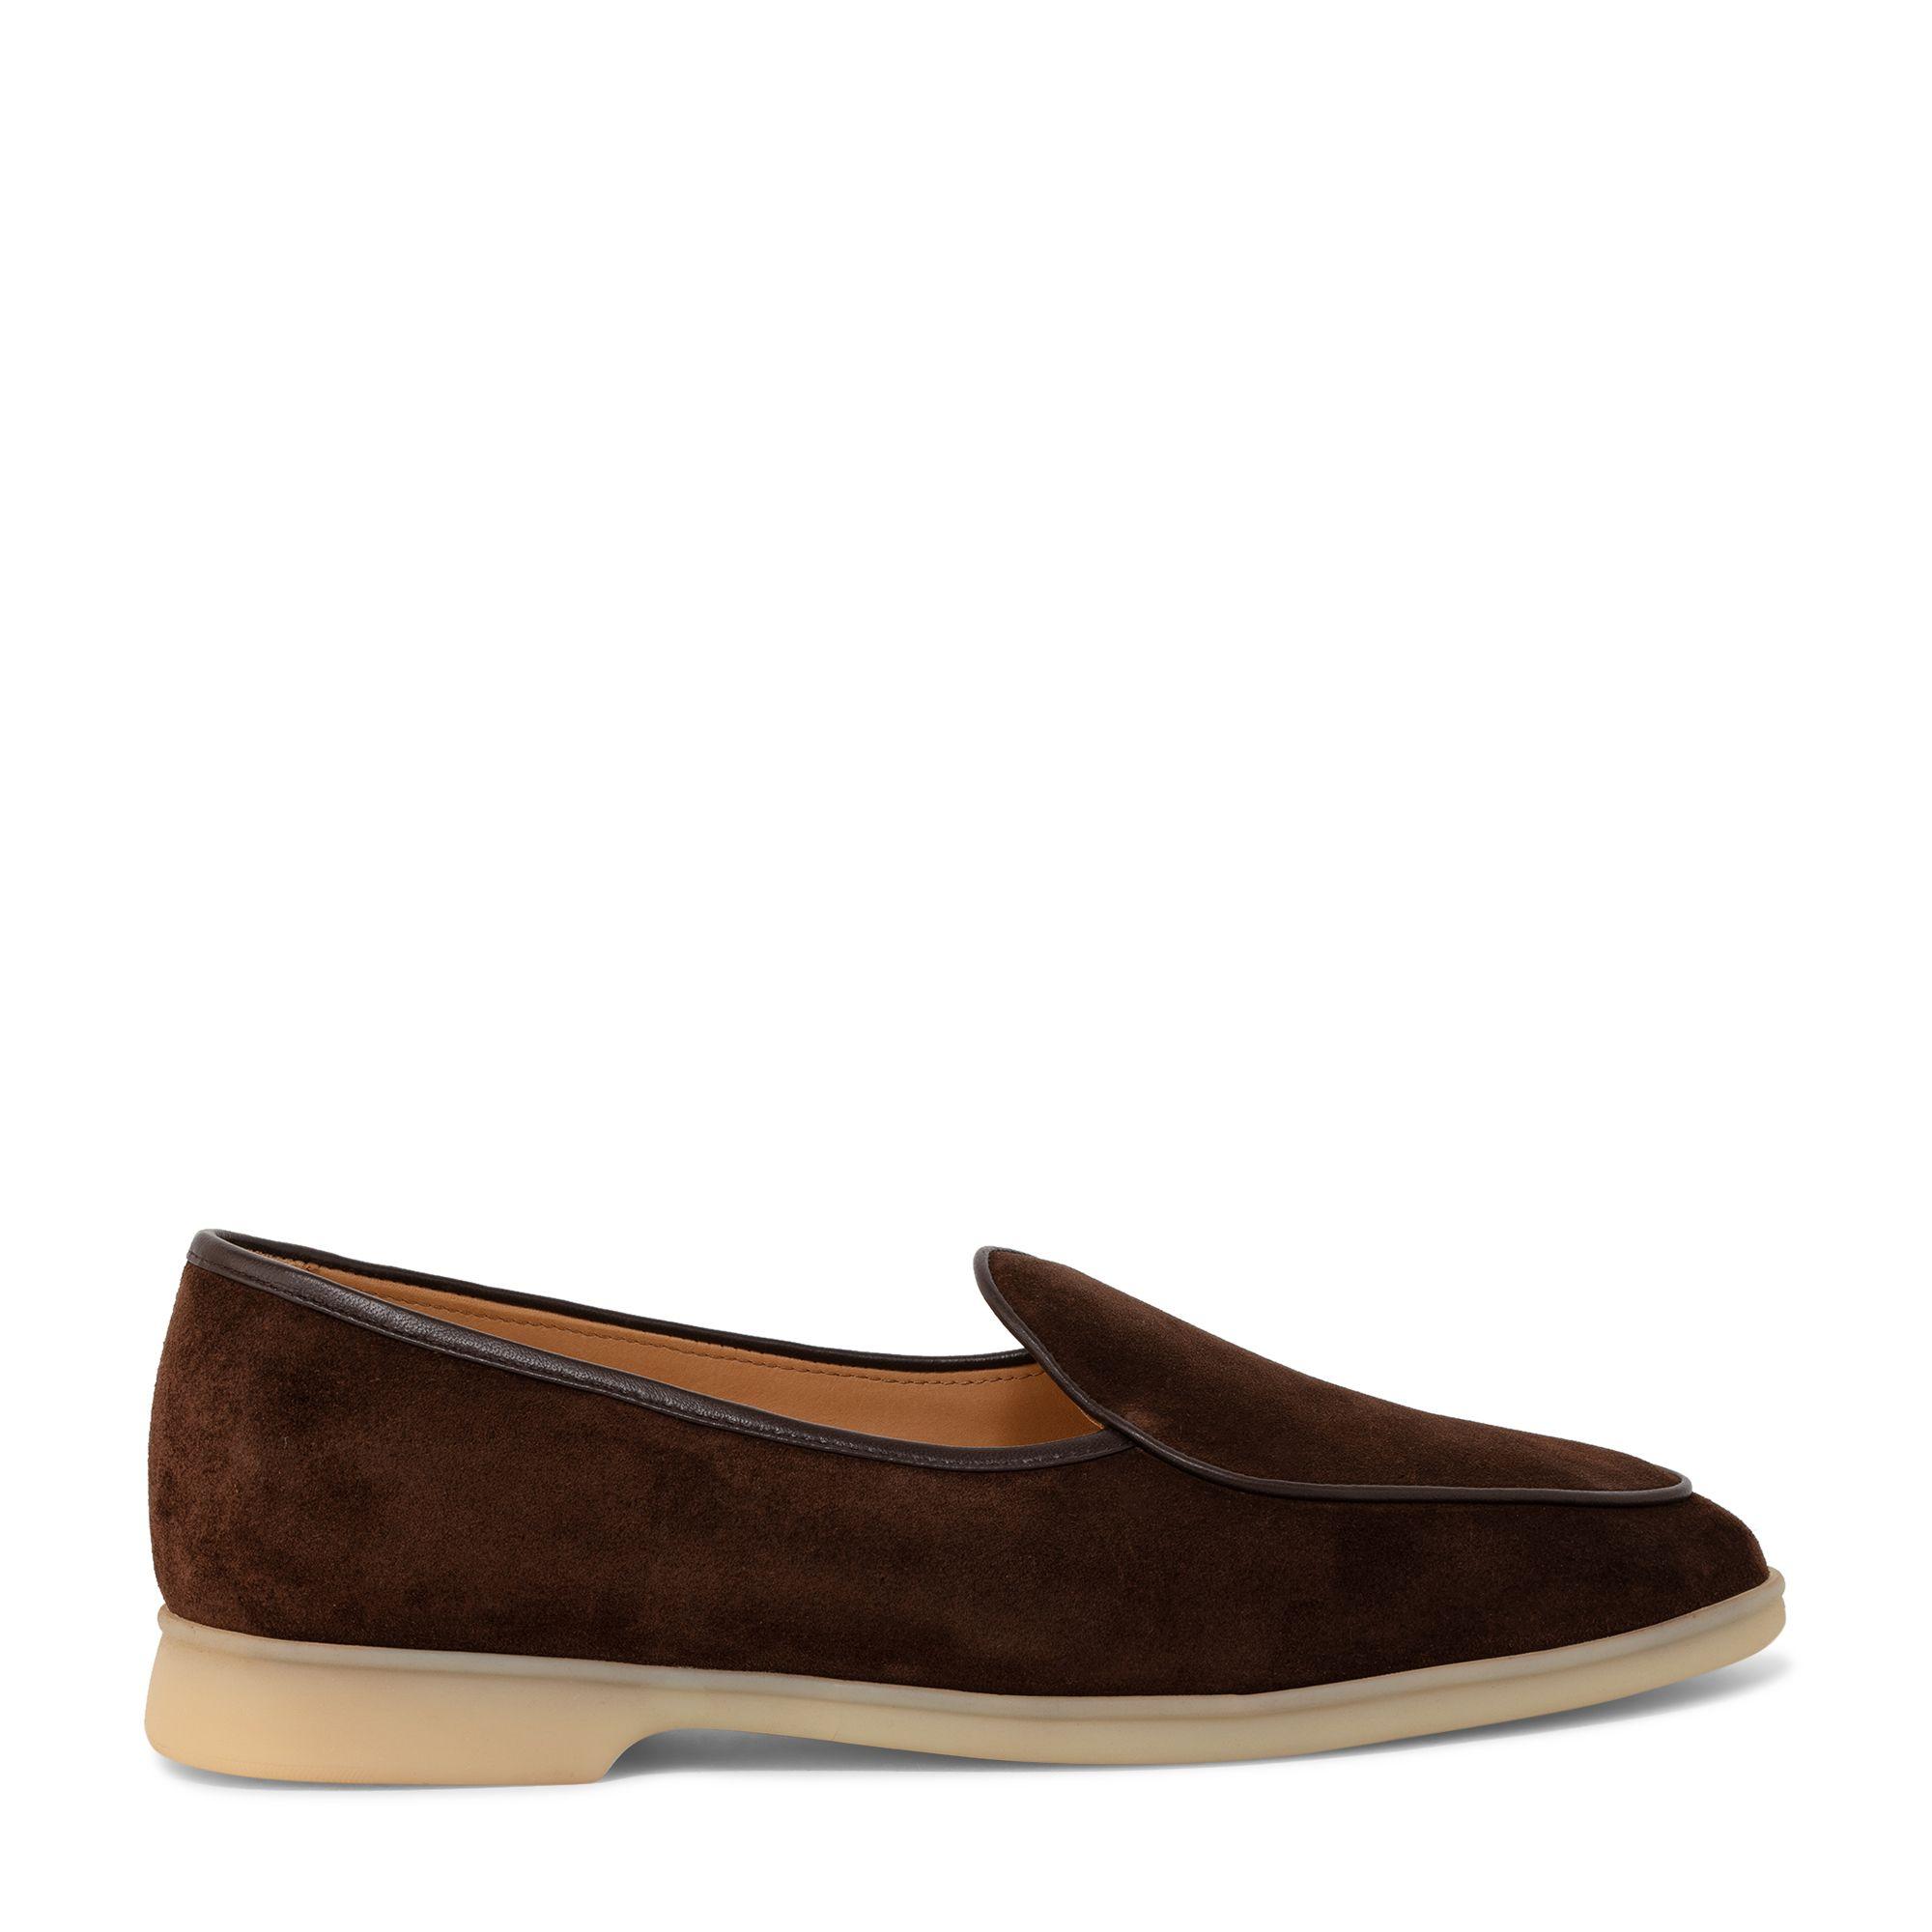 Sagan Stride loafers